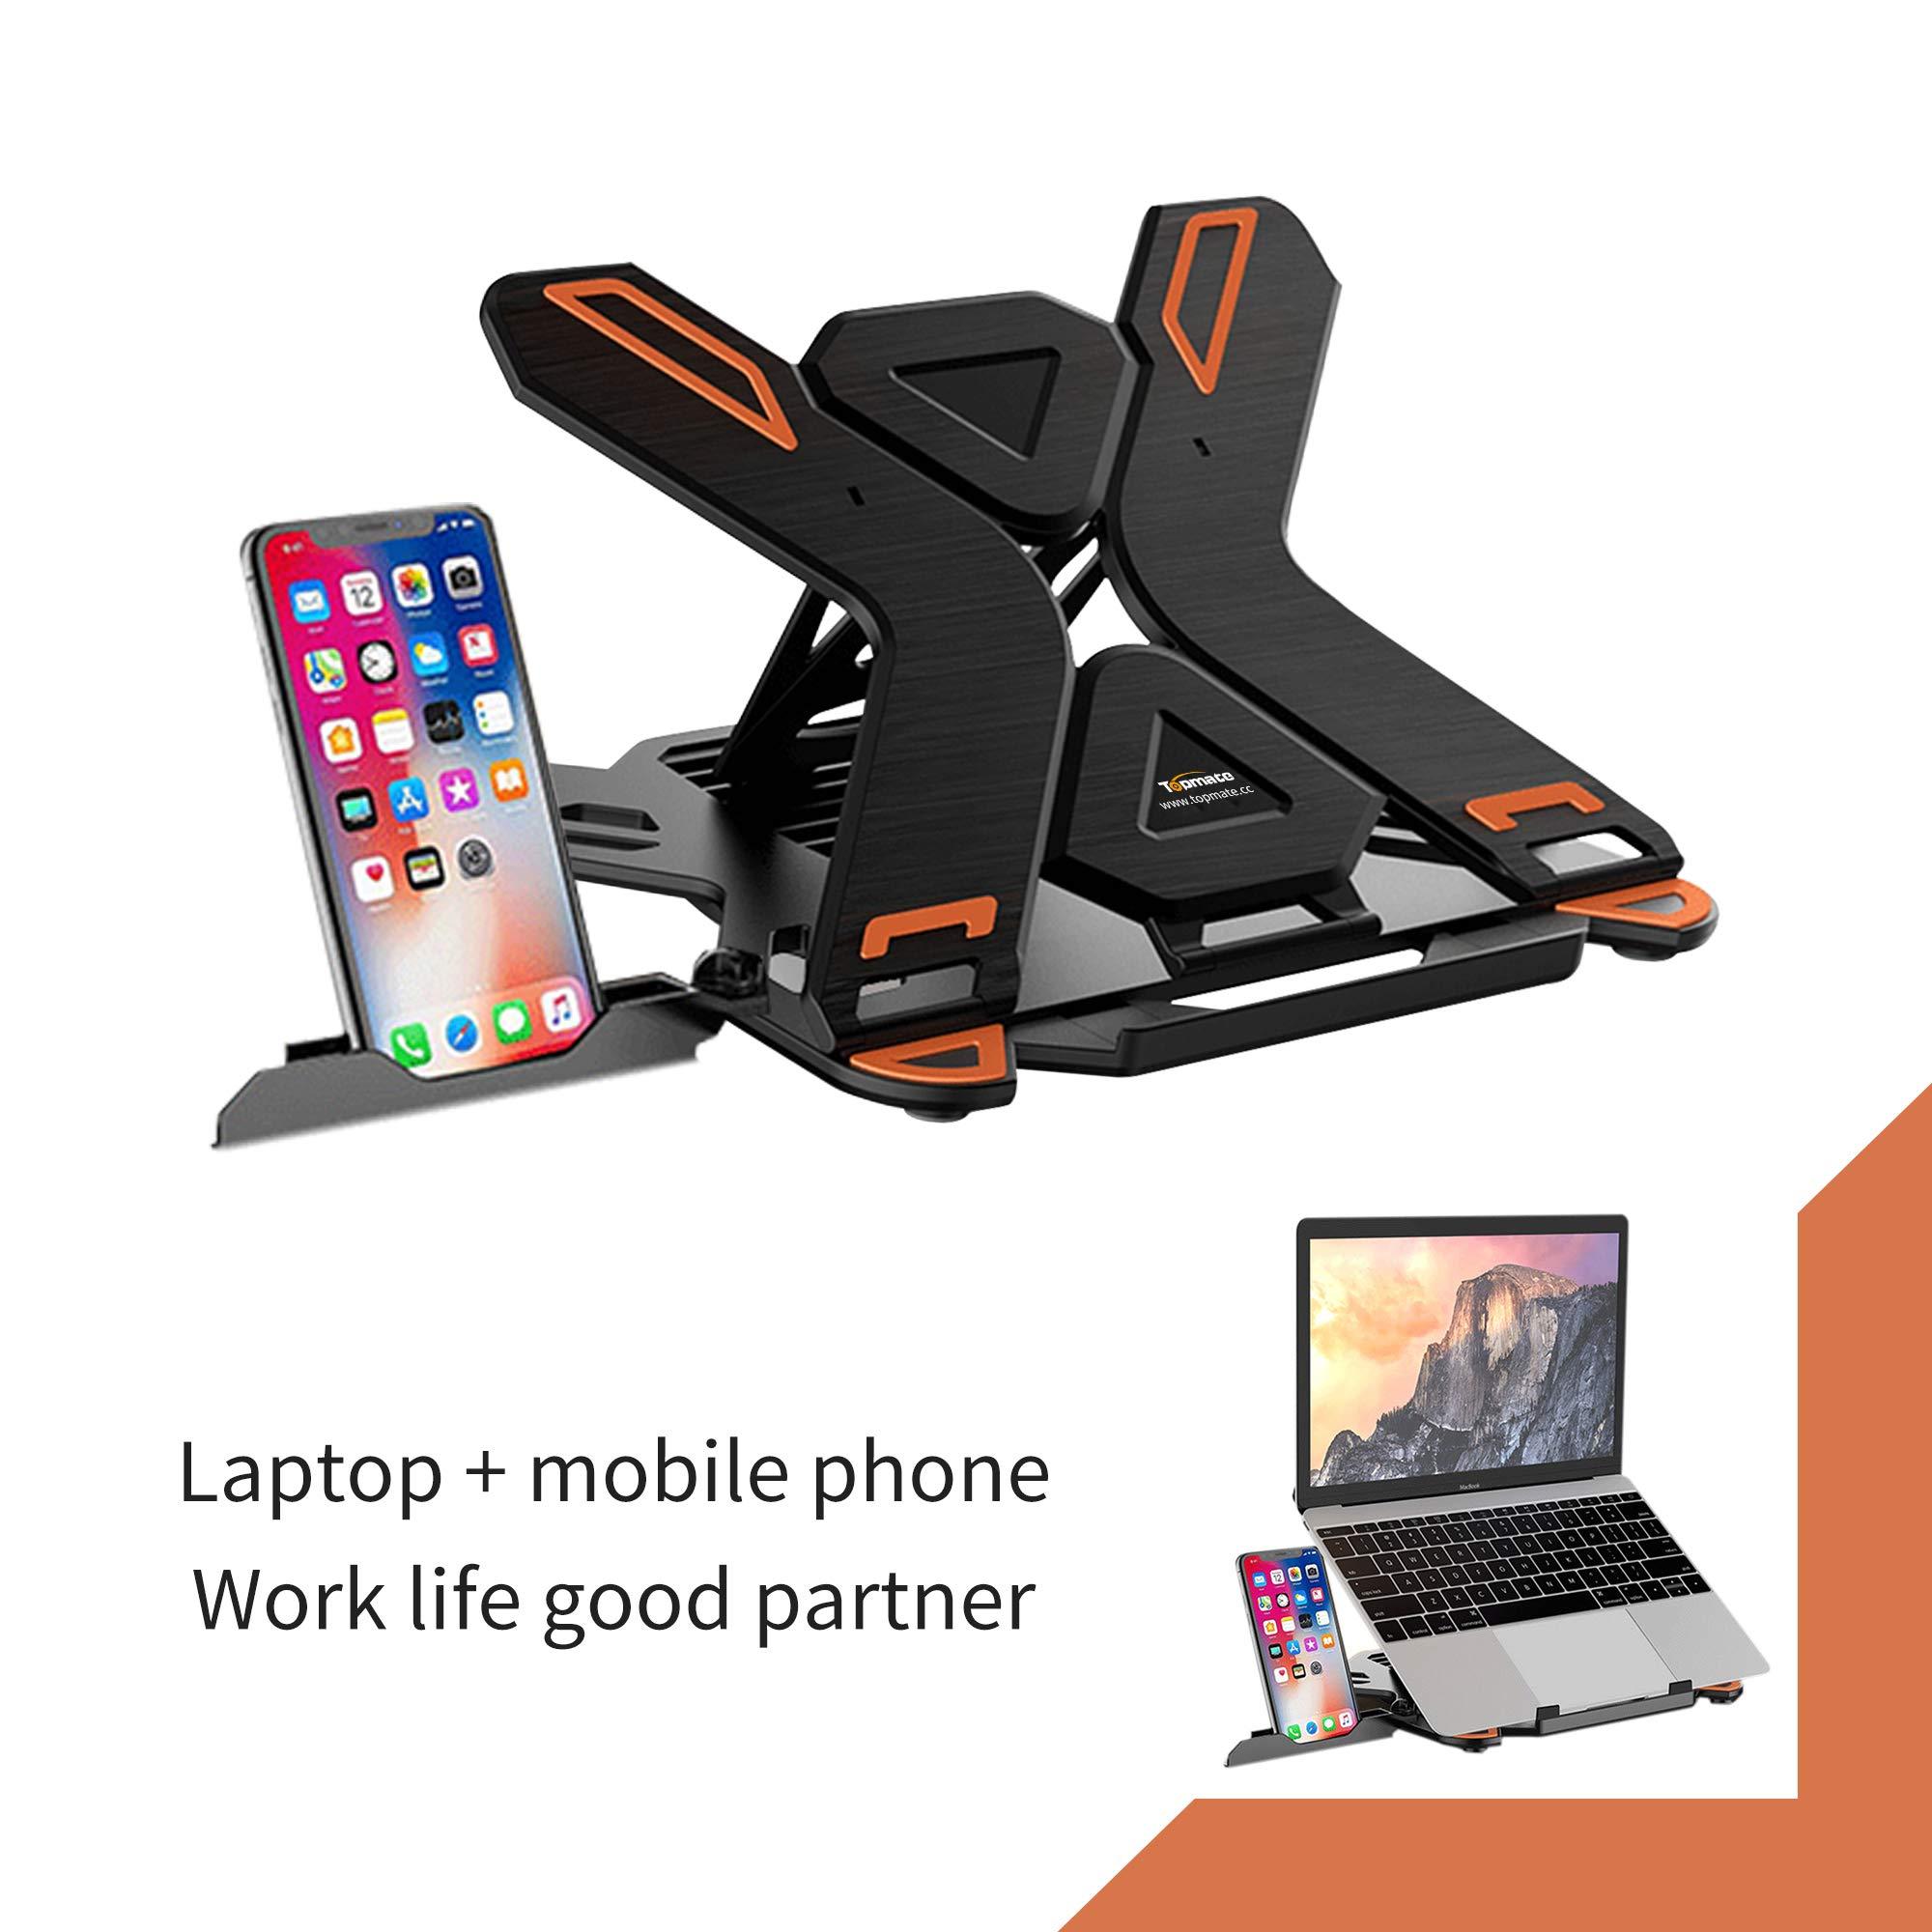 Laptop StandTopMate Portable Laptop Riser 360° SwivelBase Adjustable Eye-Level Ergonomic DesignFoldable Desktop Notebook Holder Mount with Phone Standfor Laptop Within 17\